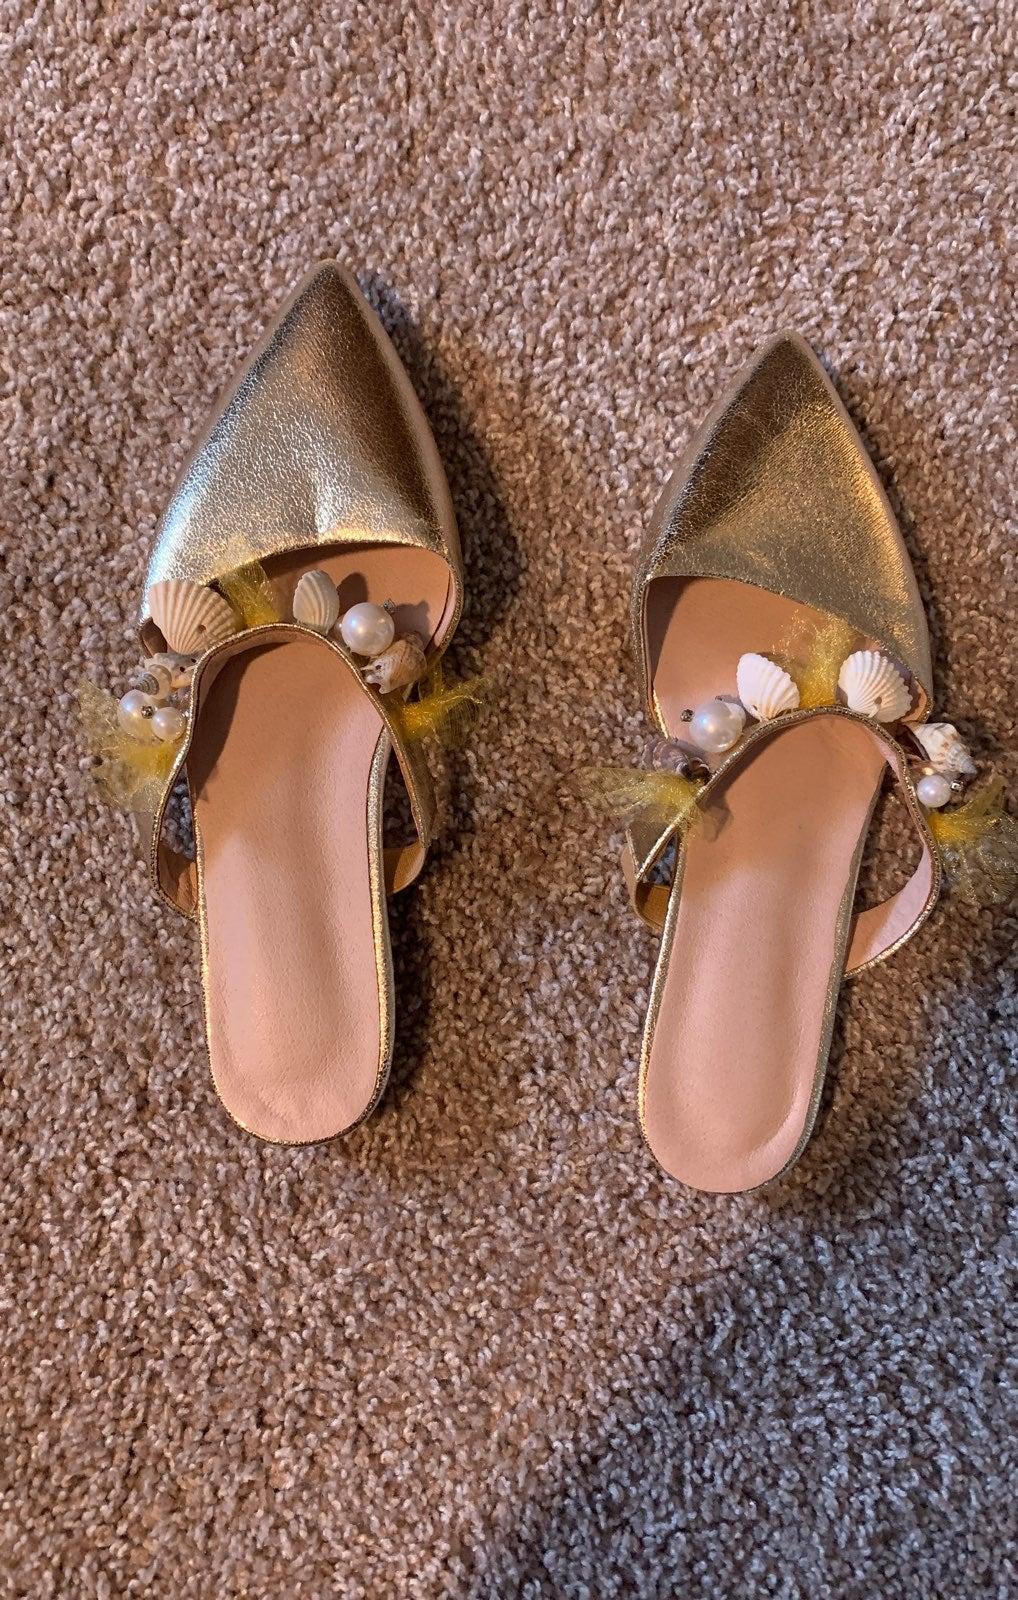 shell Sandals 8.5